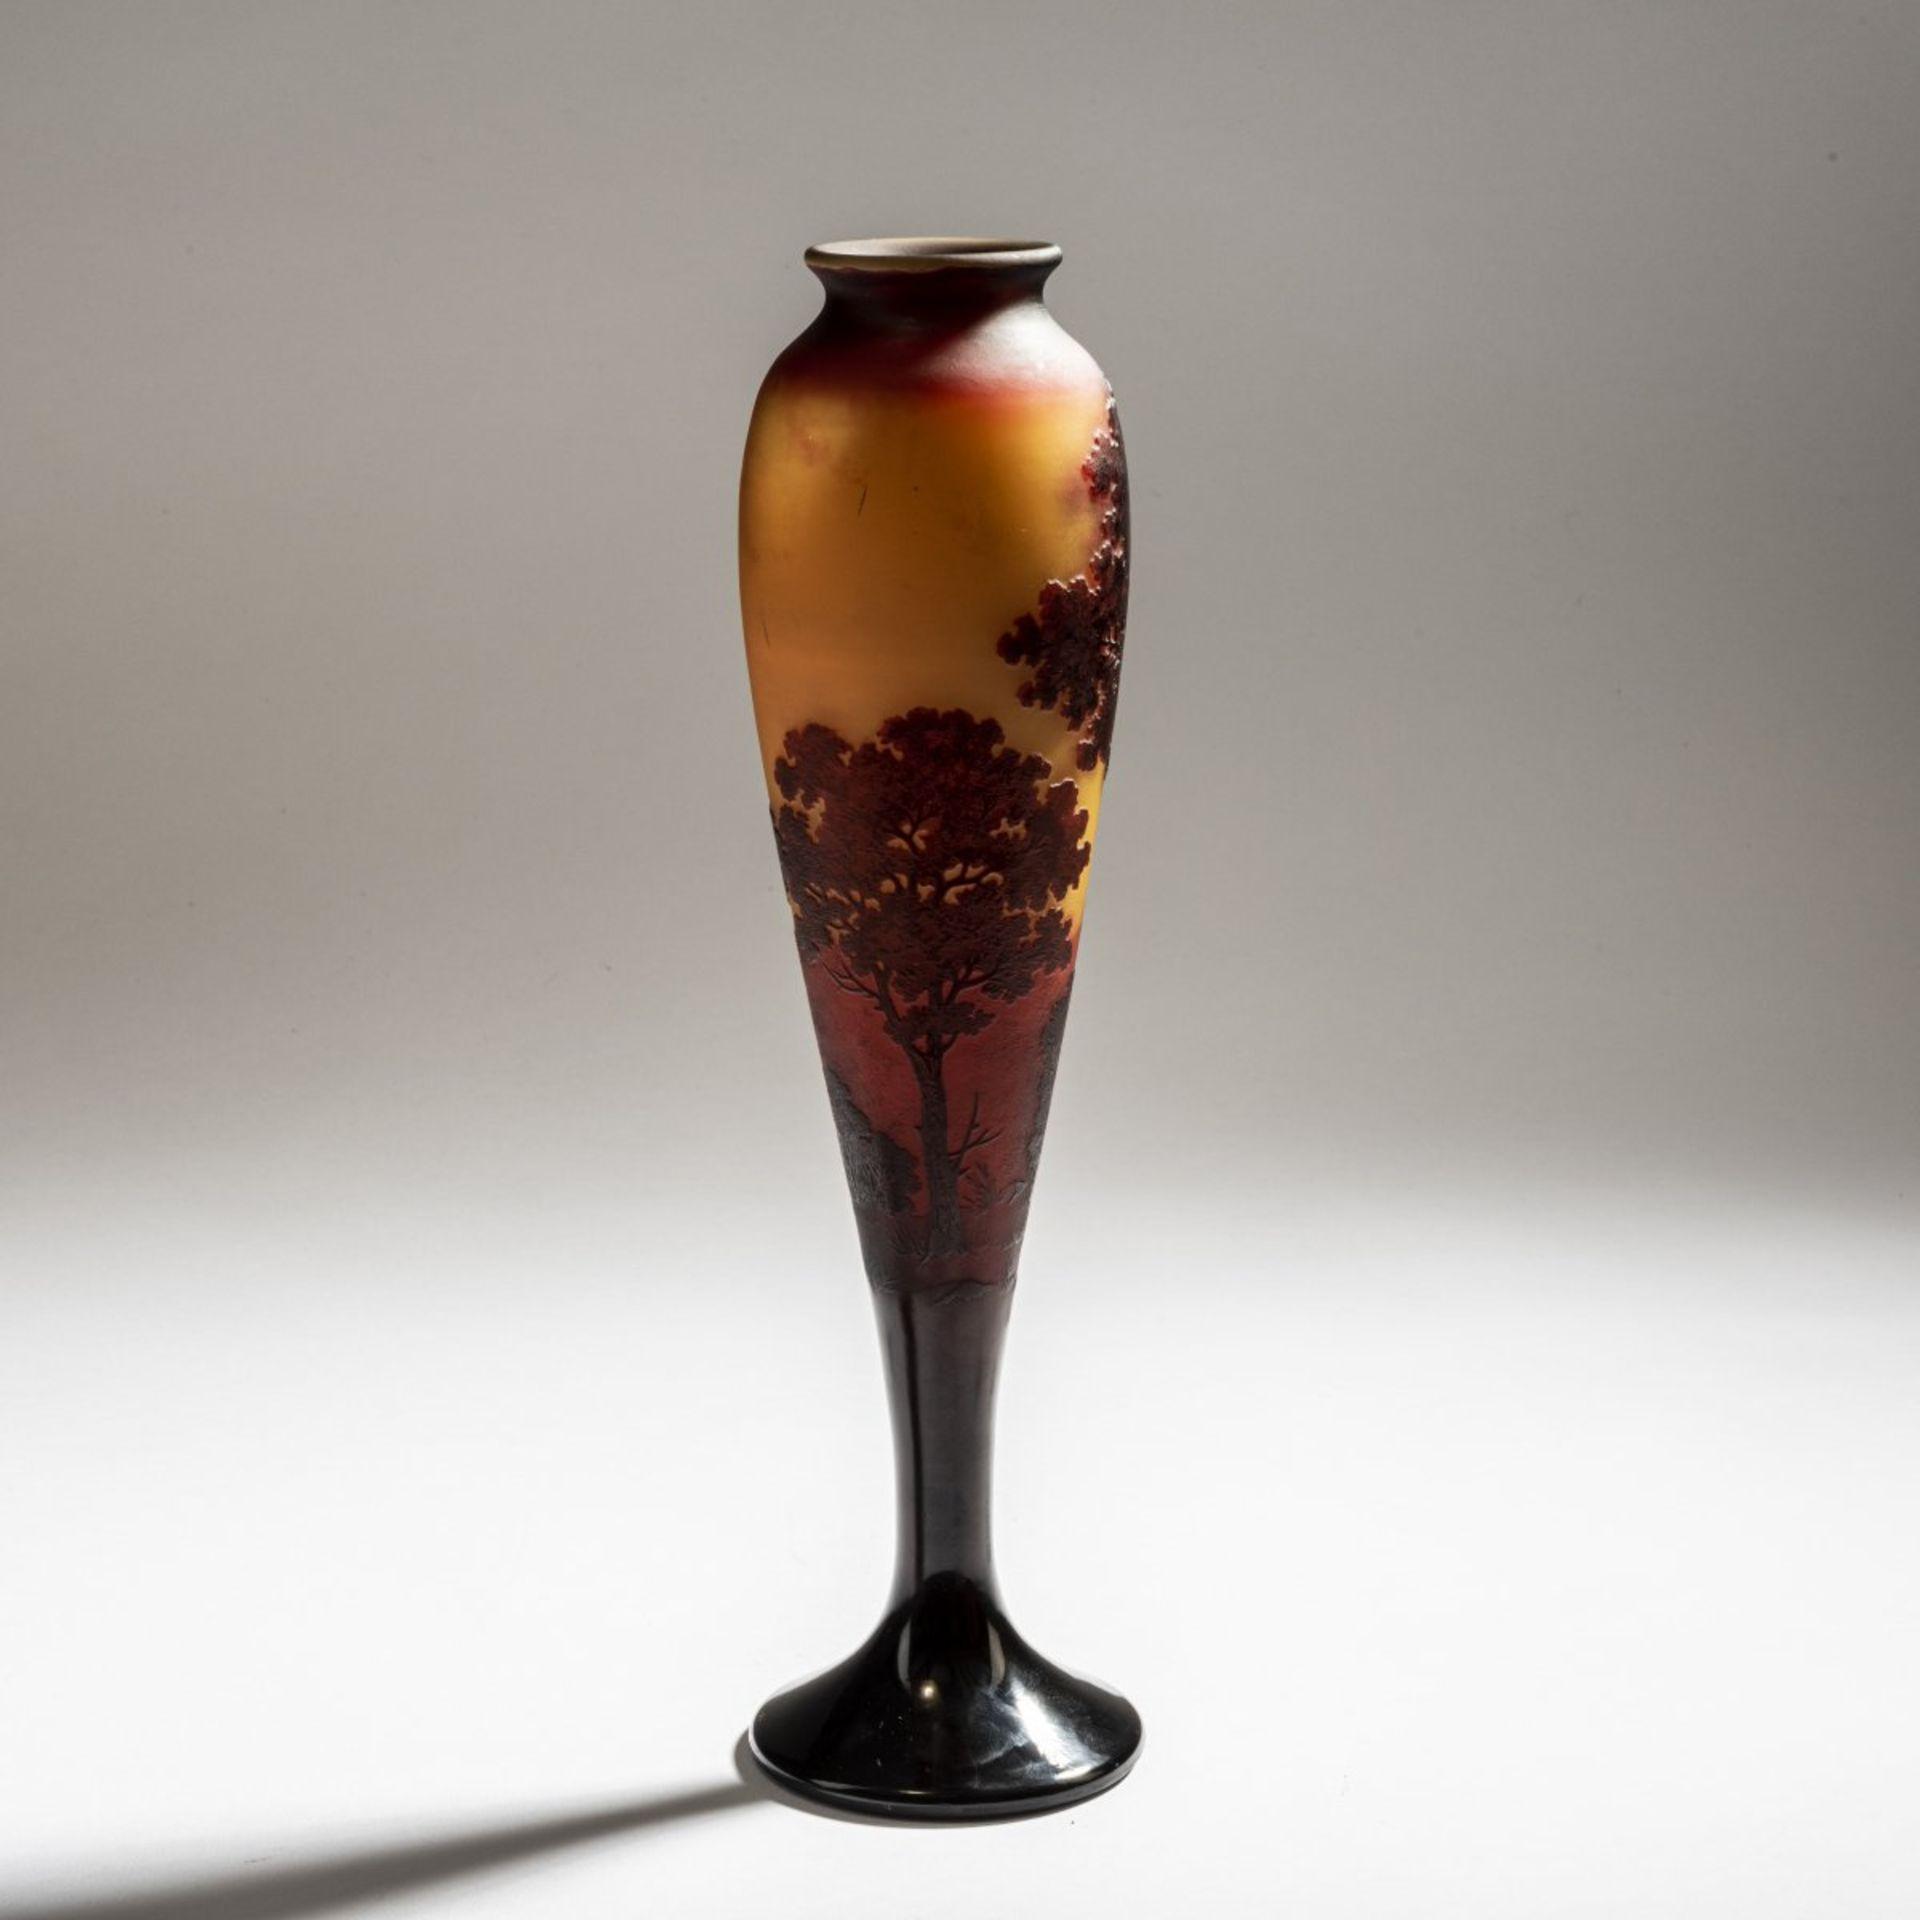 Paul Nicolas, Nancy, 'Paysage' vase, 1919-25 - Bild 2 aus 3